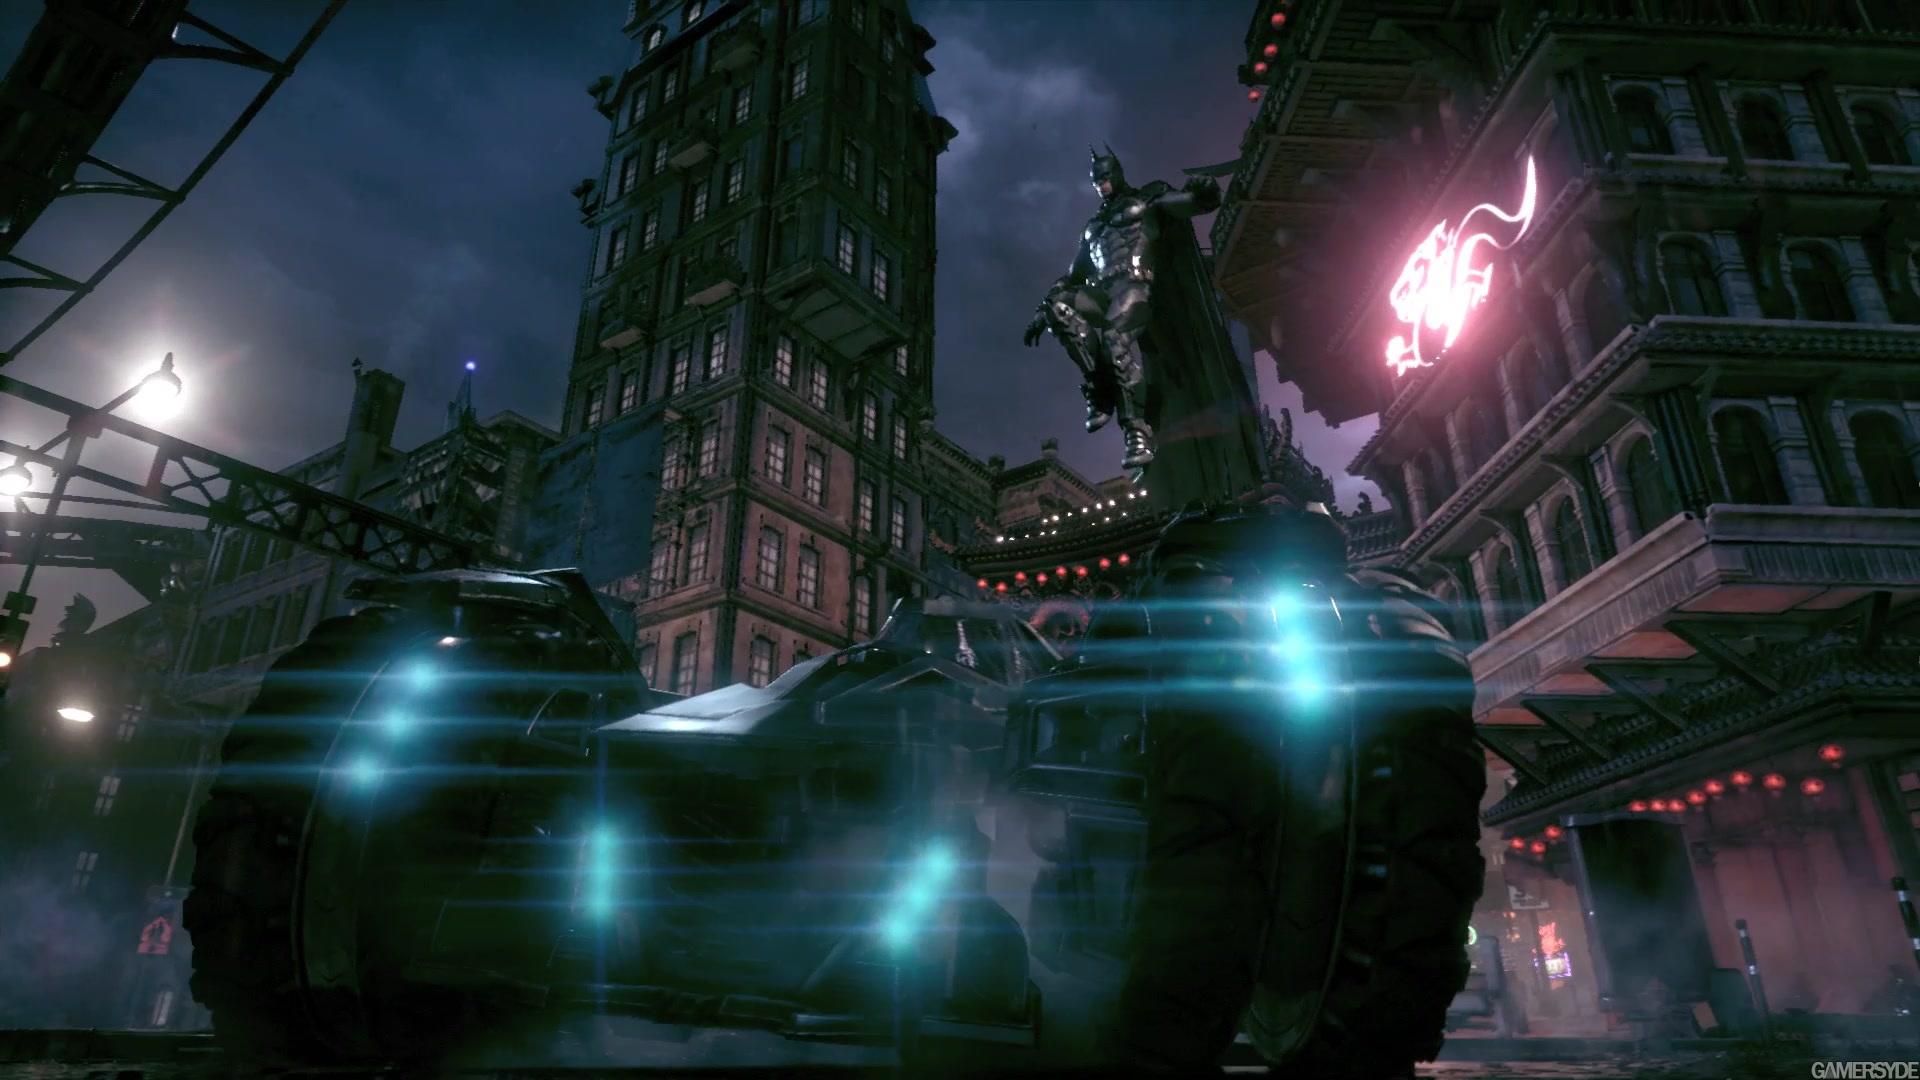 image batman arkham knight 25050 2899 0006 اولین تریلر گیم پلی Batman : Arkham Knight منتشر شد : حماسه ی نهایی